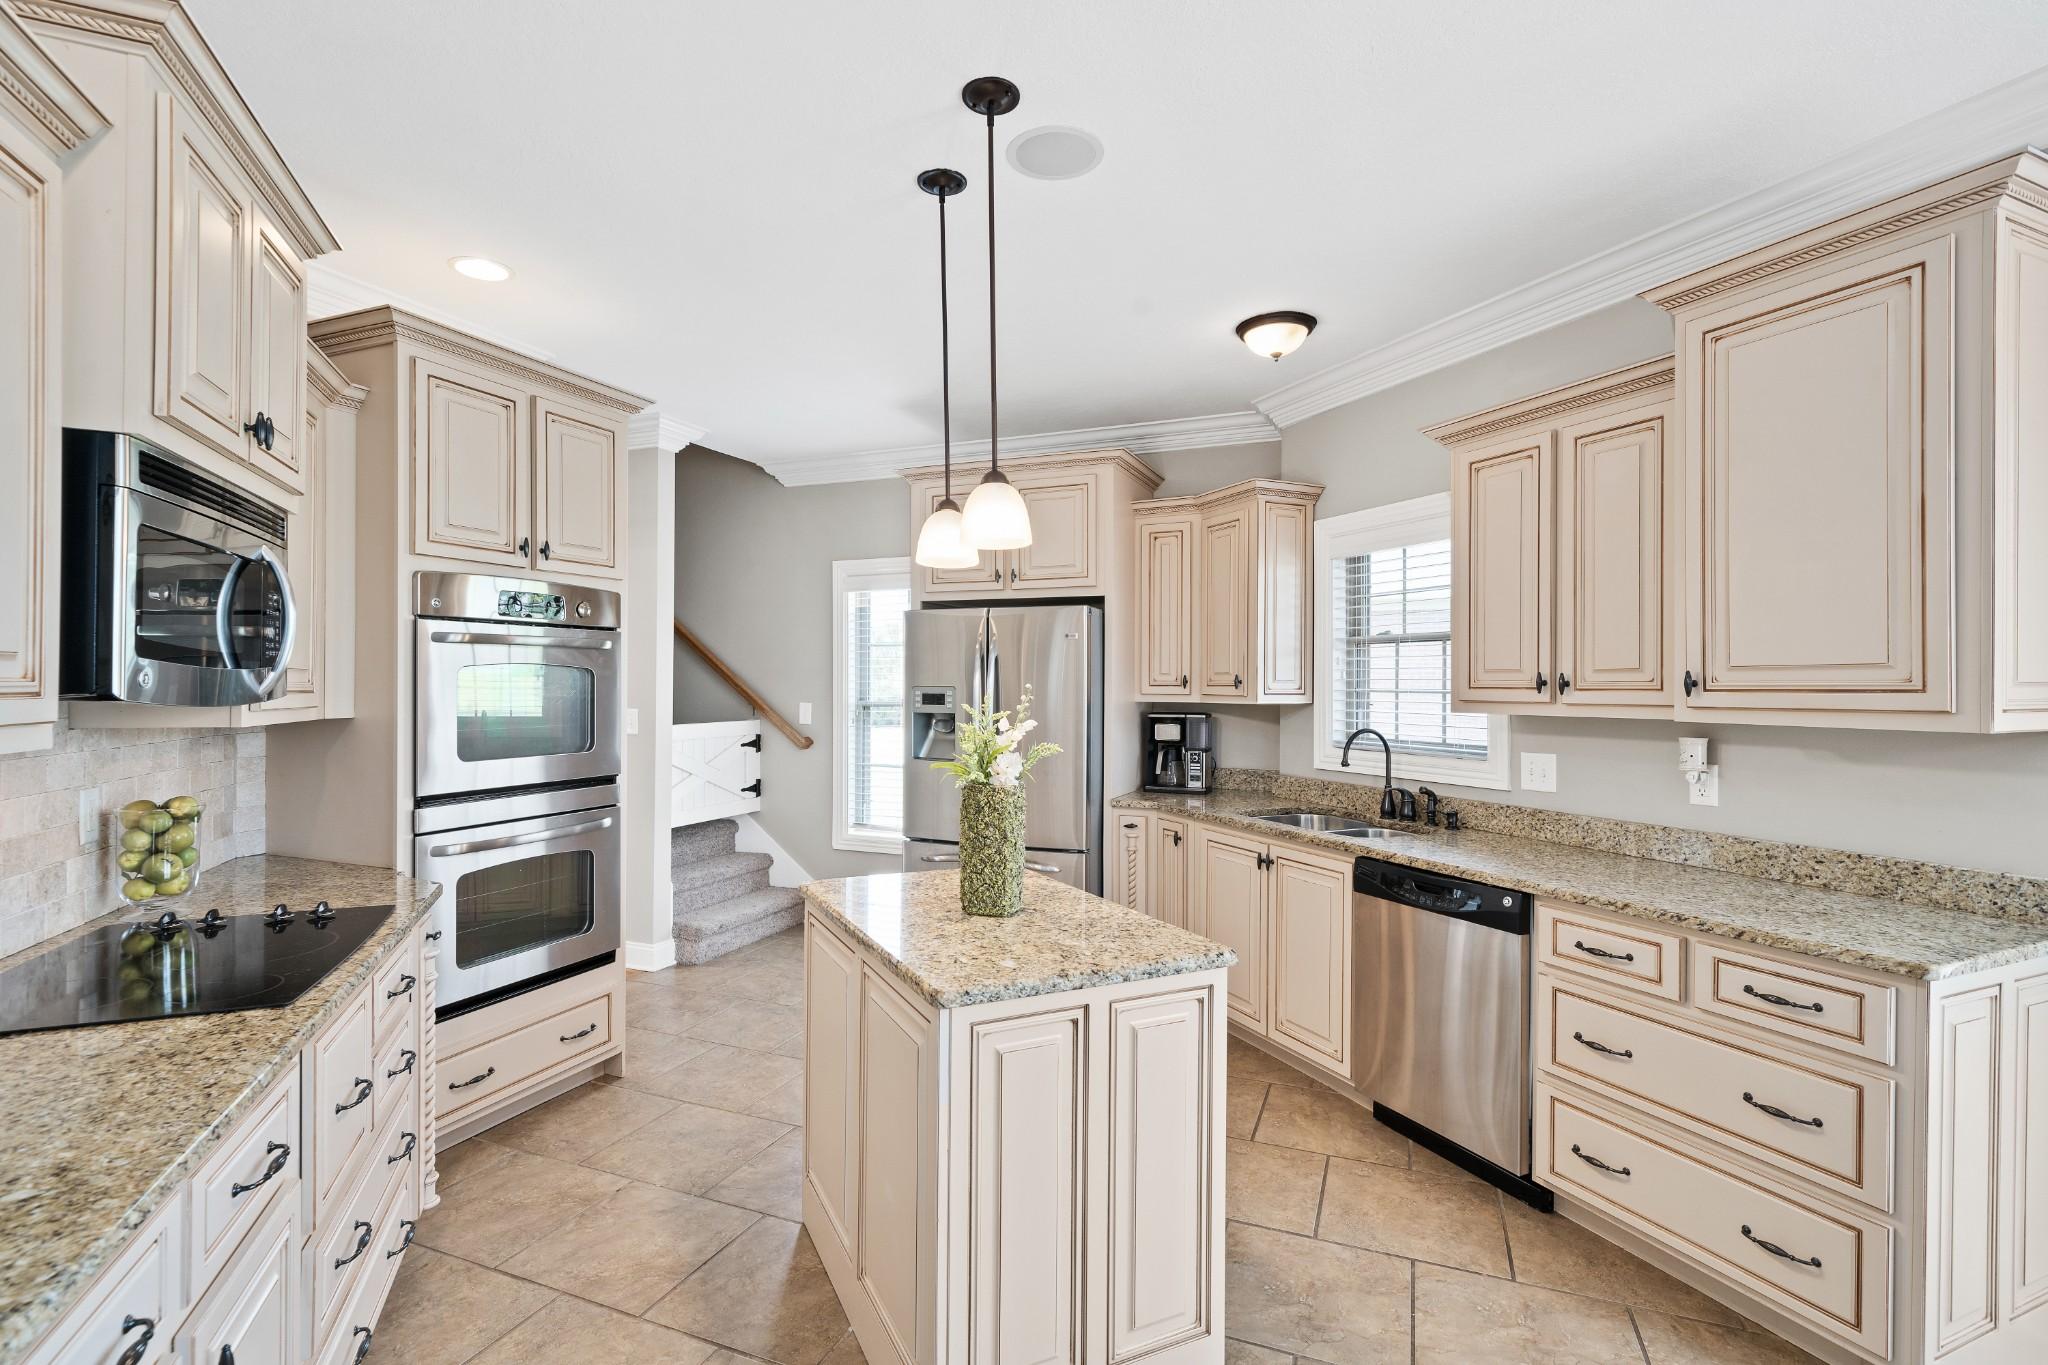 1489 Hollis Ridge Property Photo - Clarksville, TN real estate listing